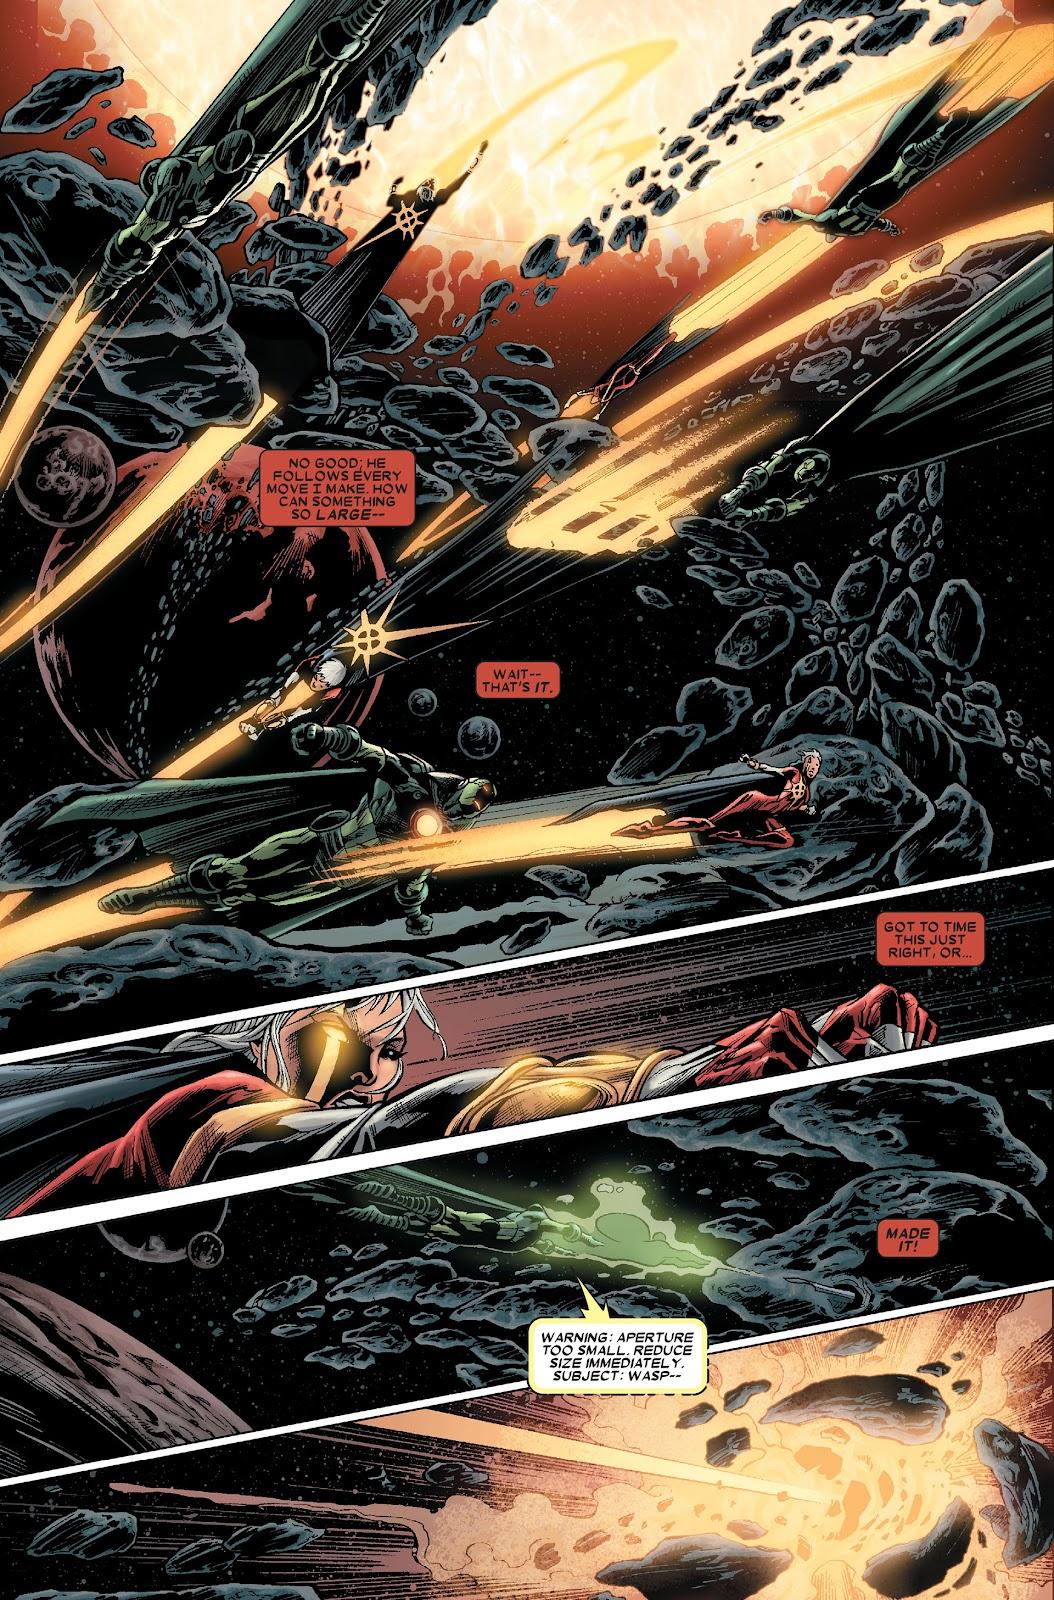 Annihilation: Conquest - Quasar issue 1 - Page 11